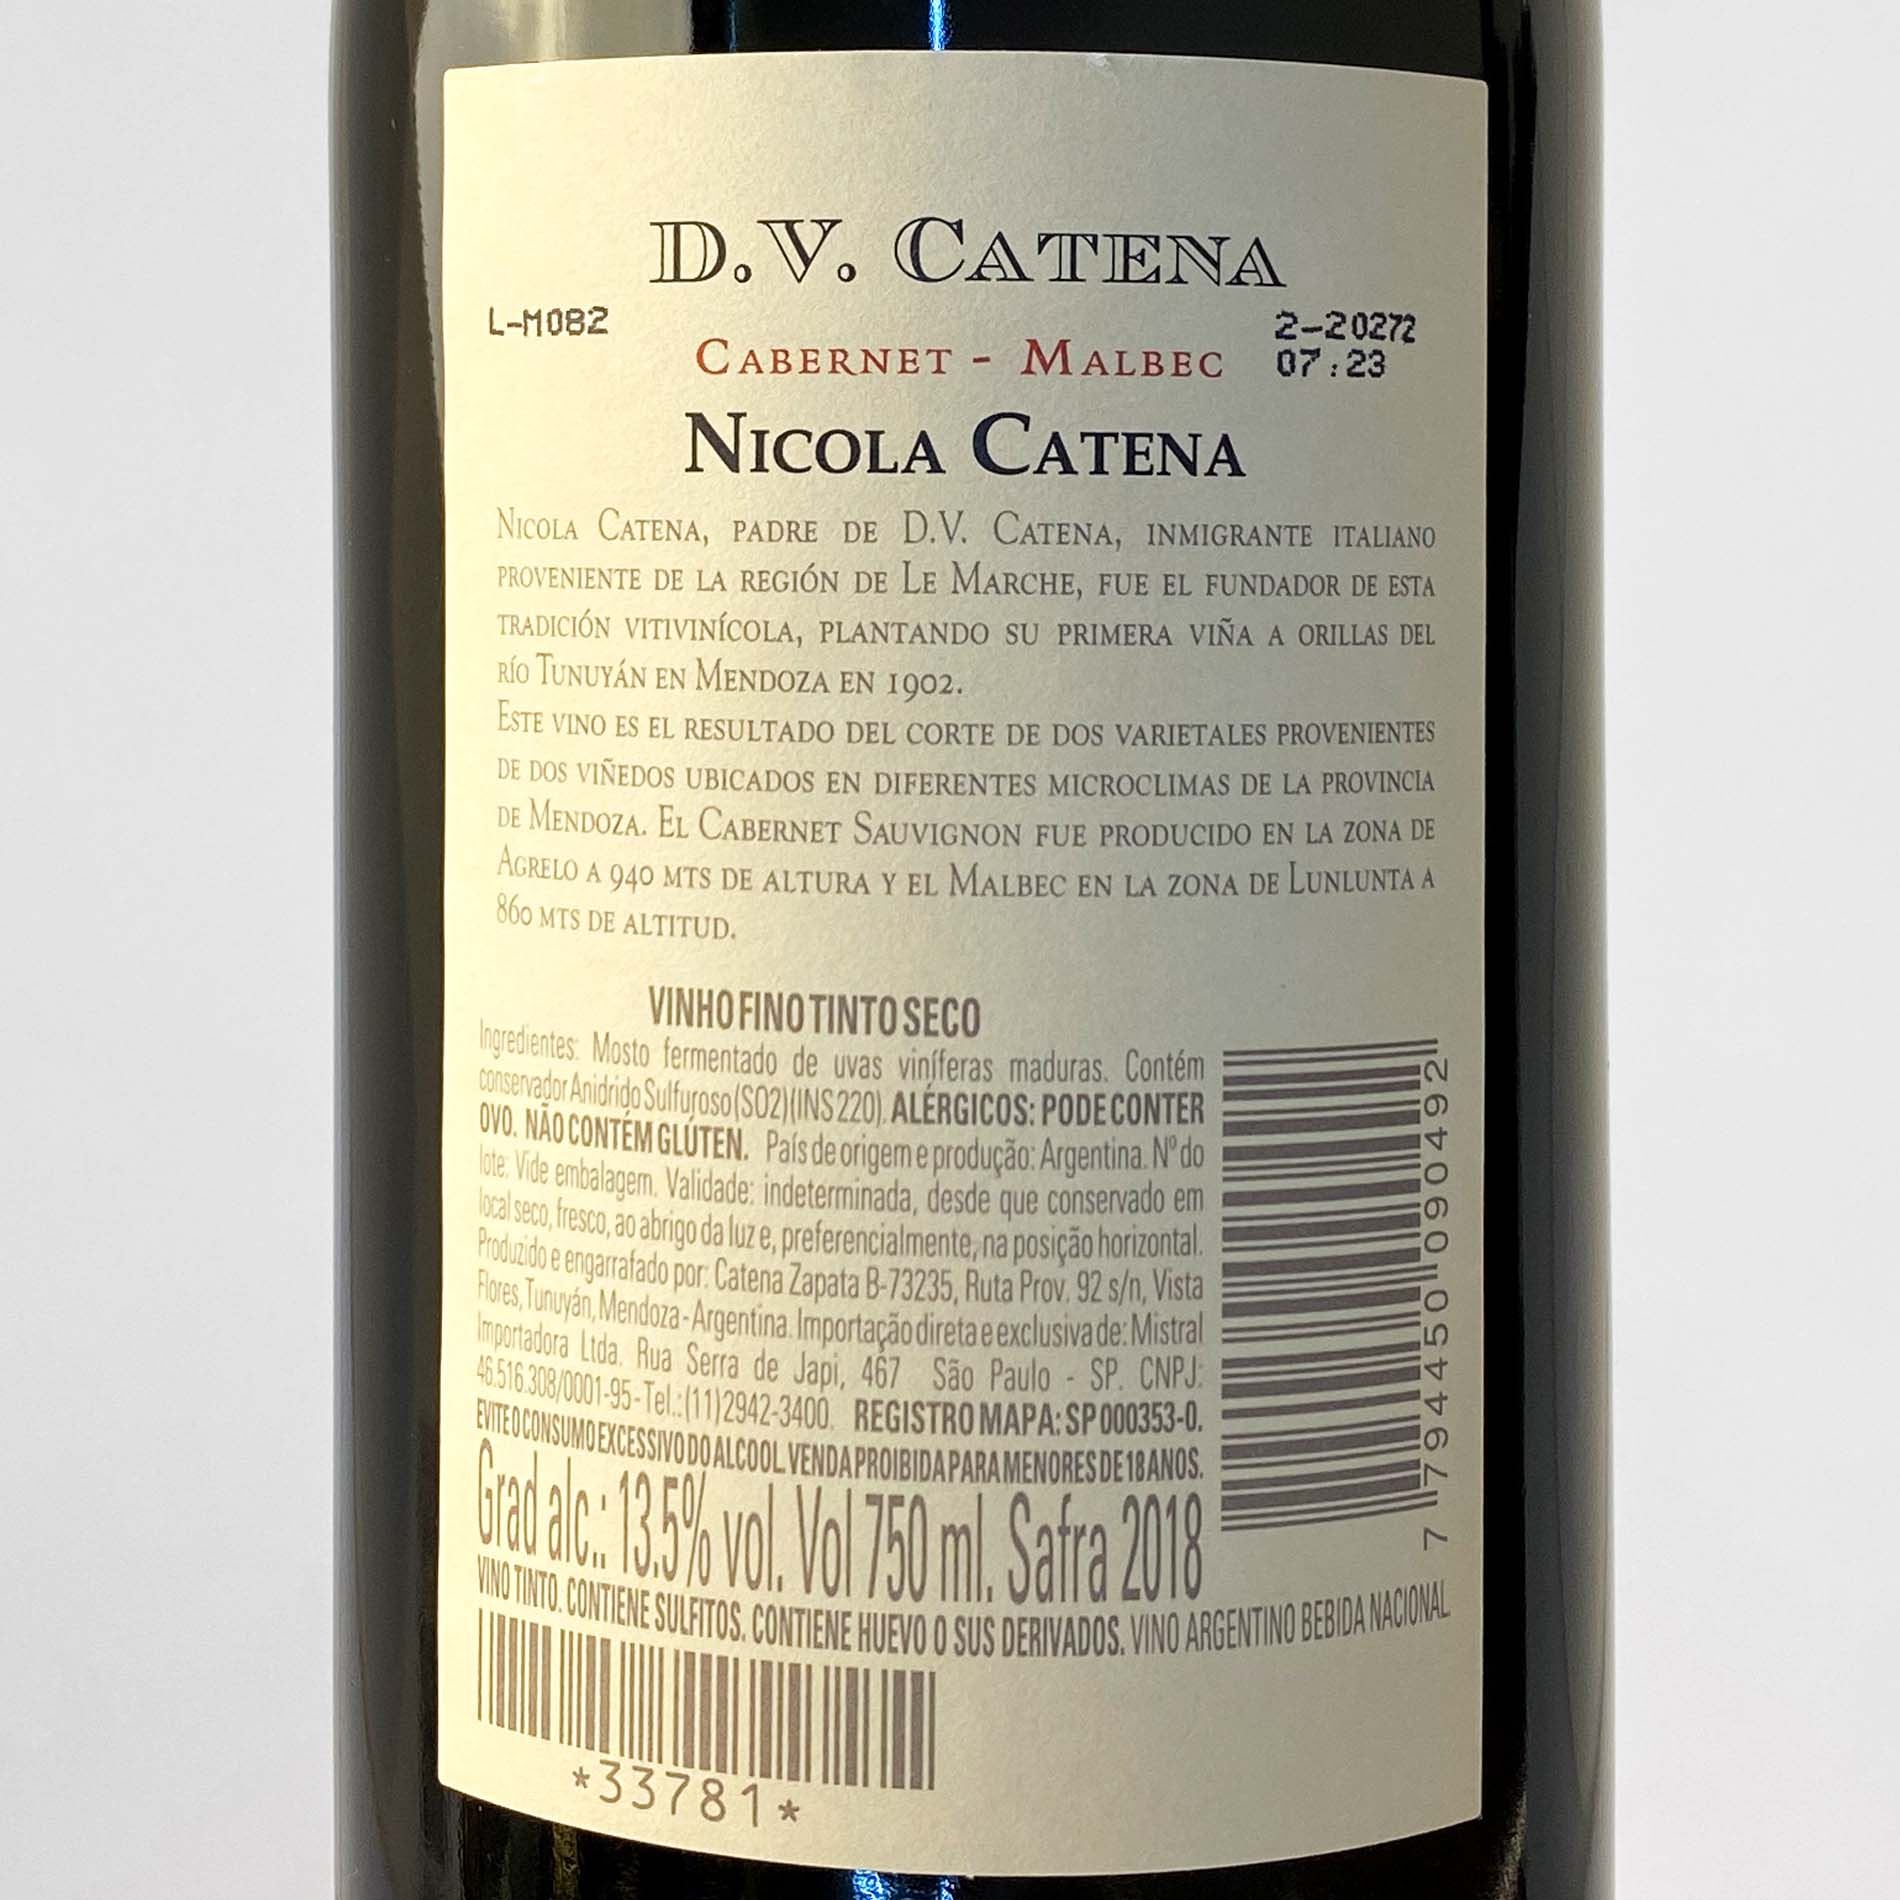 DV Catena Cabernet-Malbec  - Vinerize